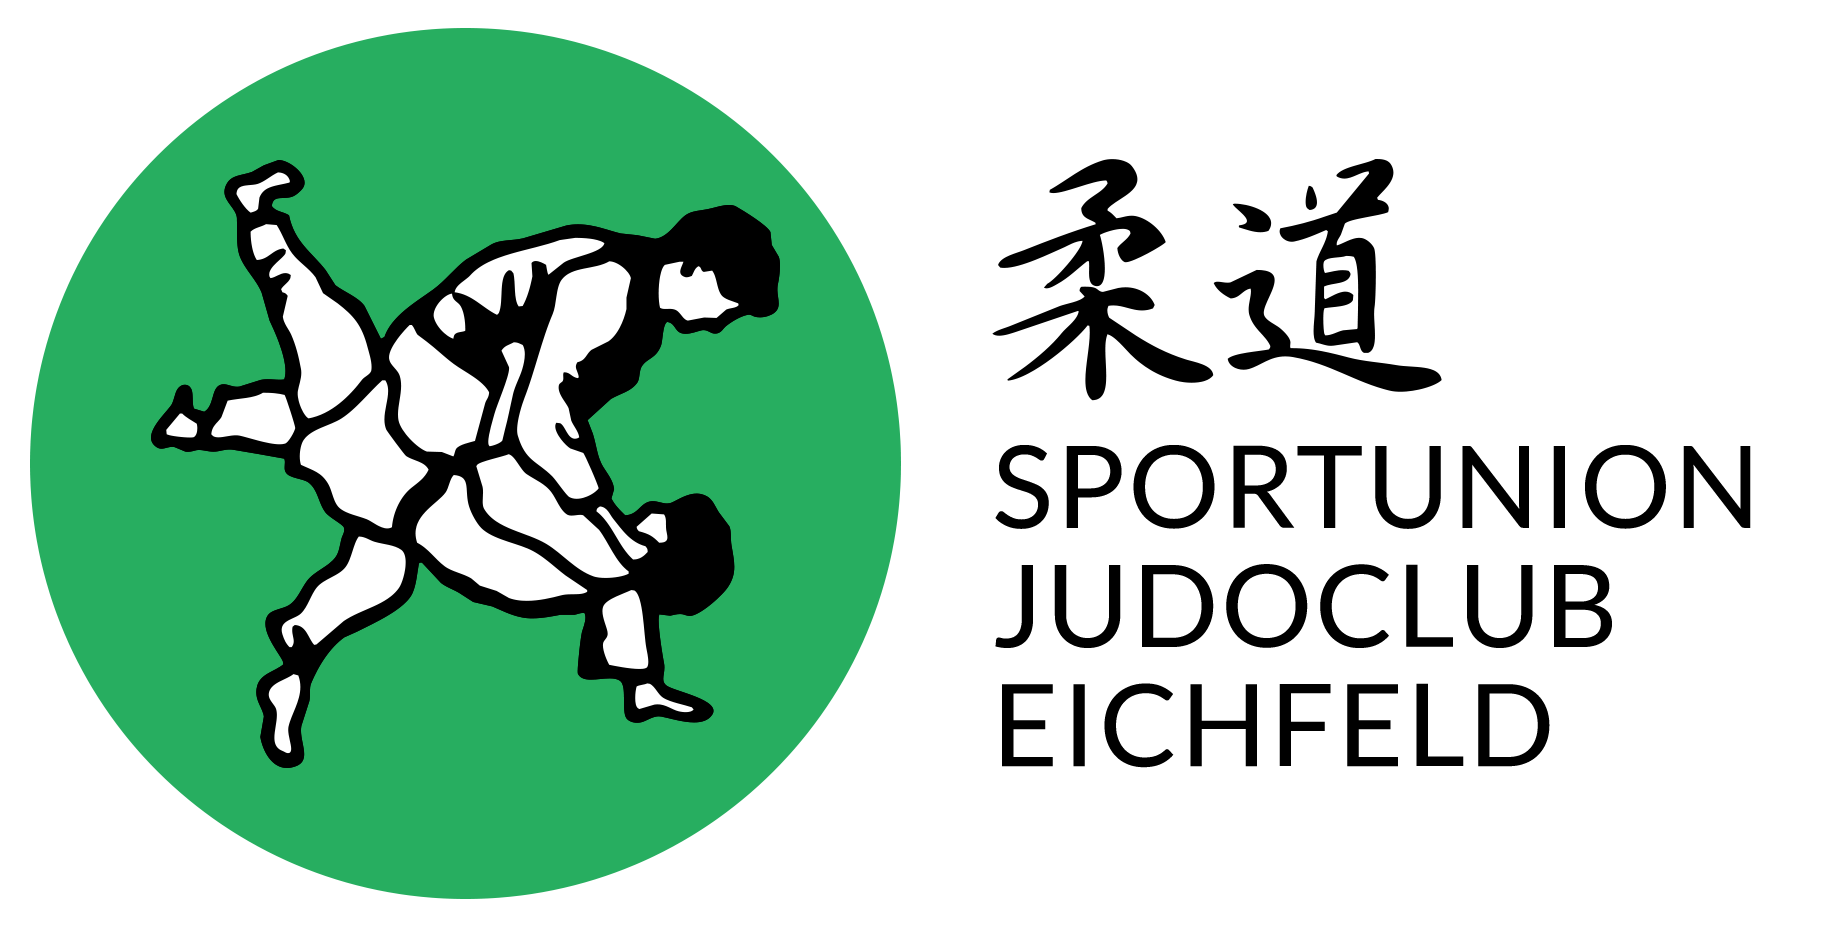 Sportunion Judoclub Eichfeld